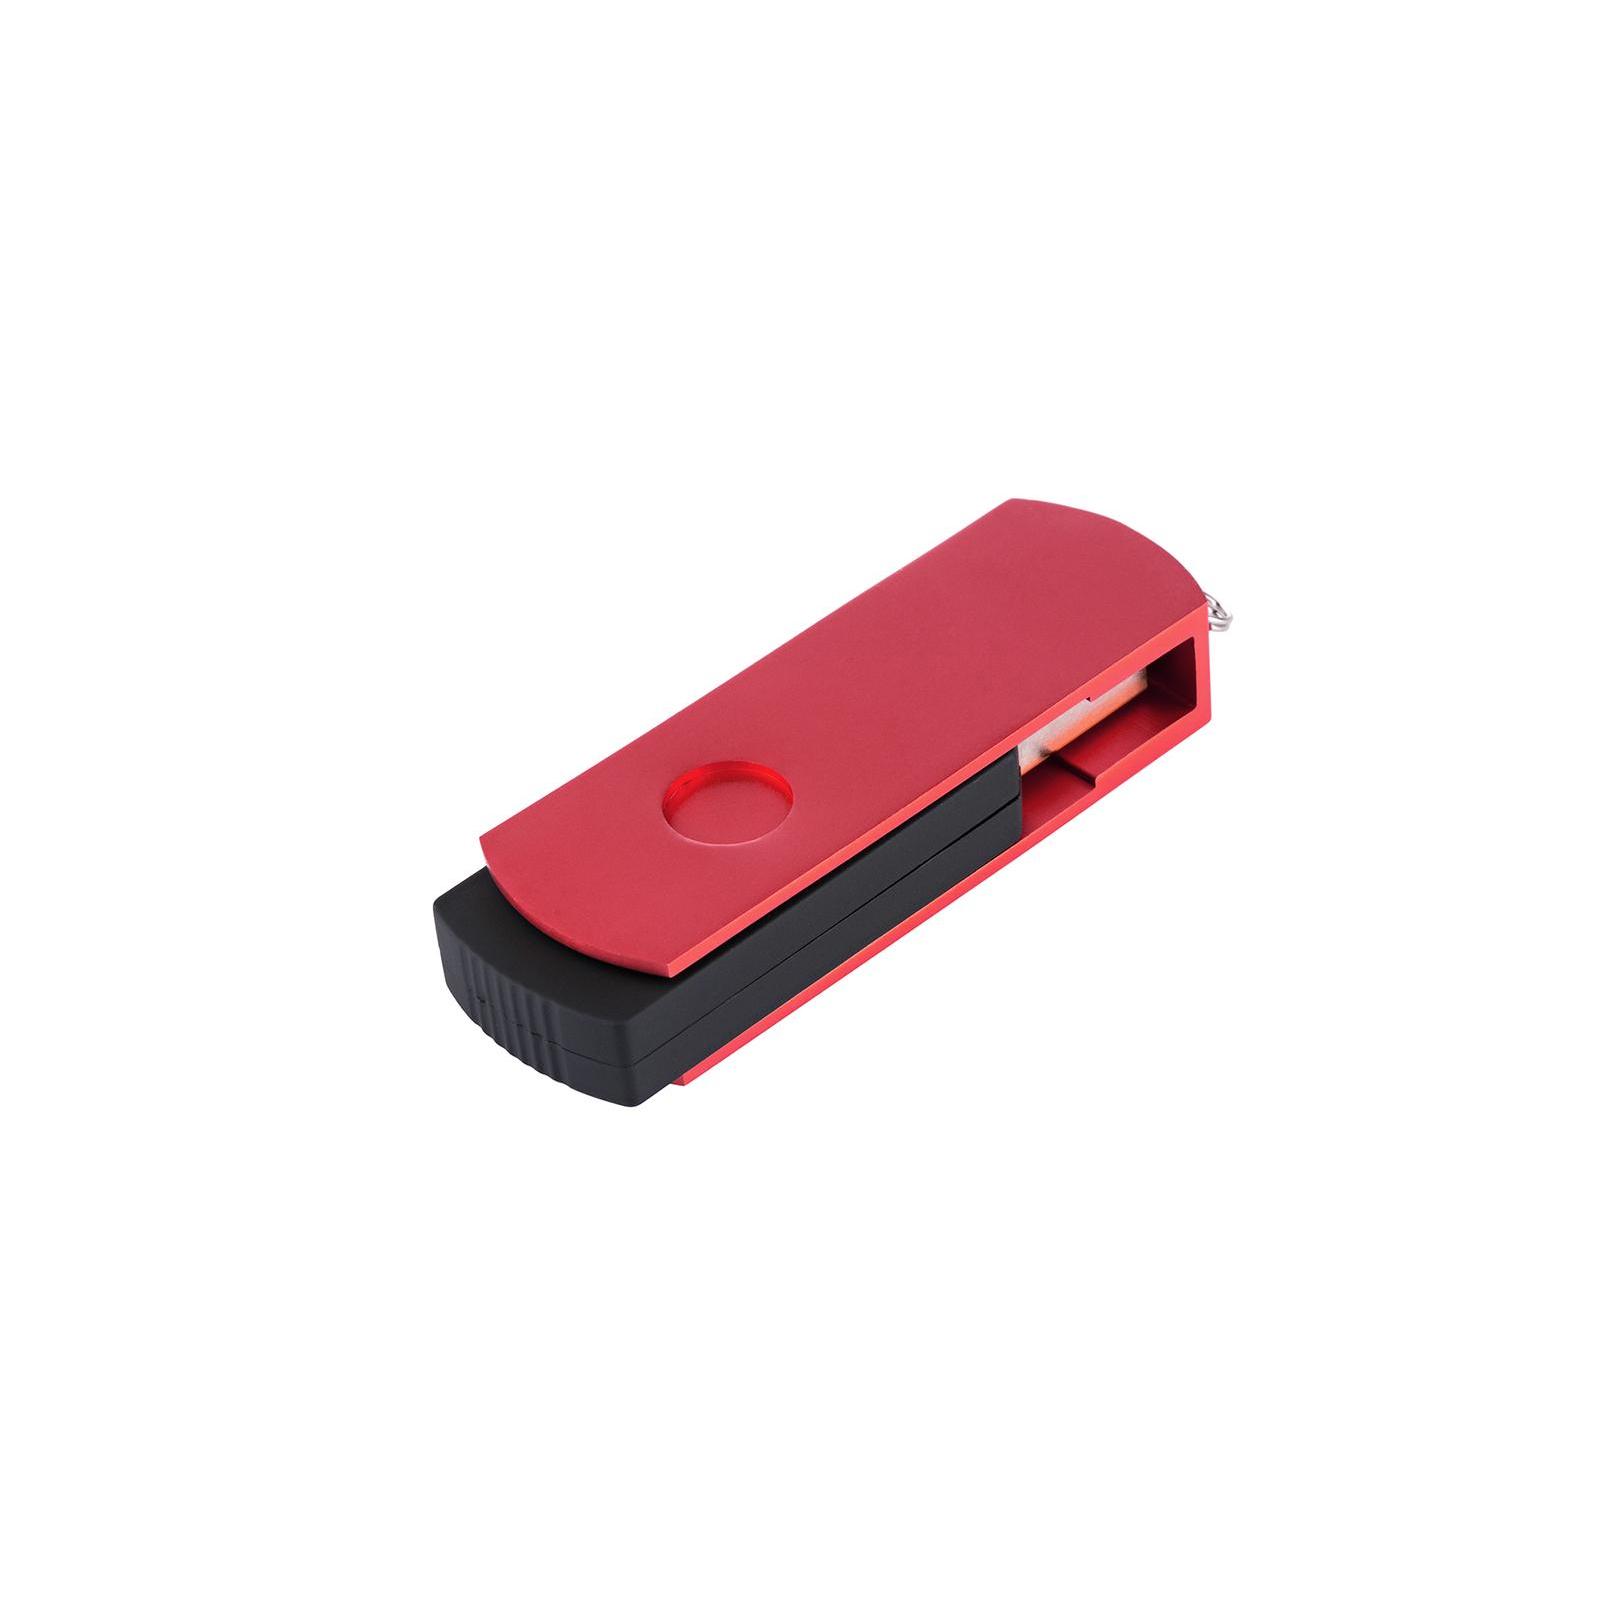 USB флеш накопитель eXceleram 16GB P2 Series Red/Black USB 3.1 Gen 1 (EXP2U3REB16) изображение 6